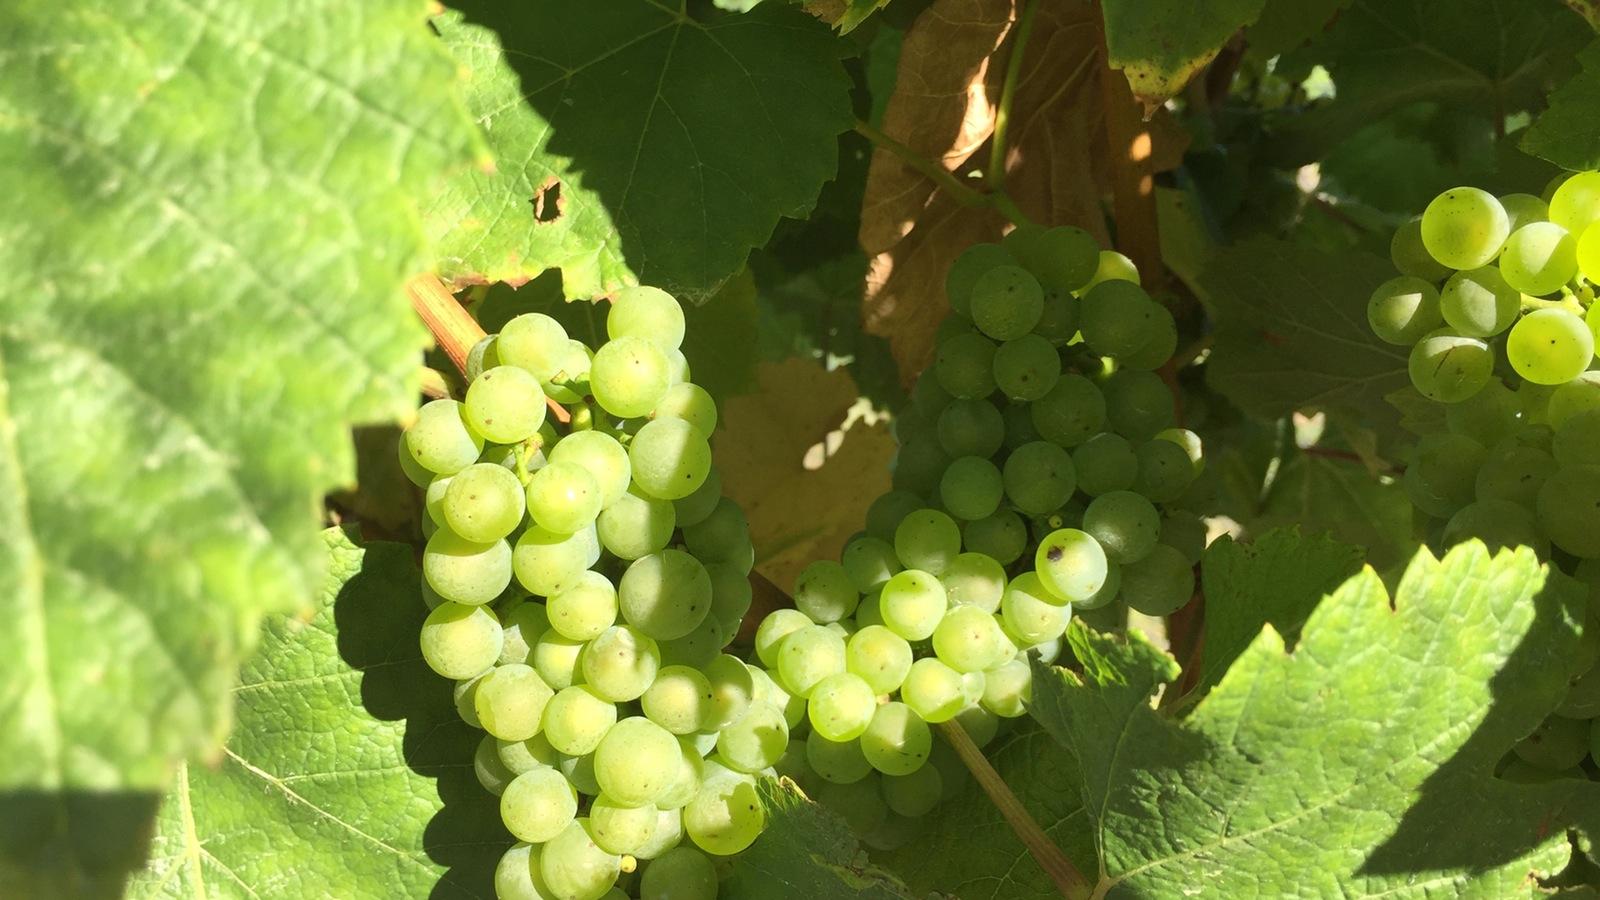 Vine ripened grapes